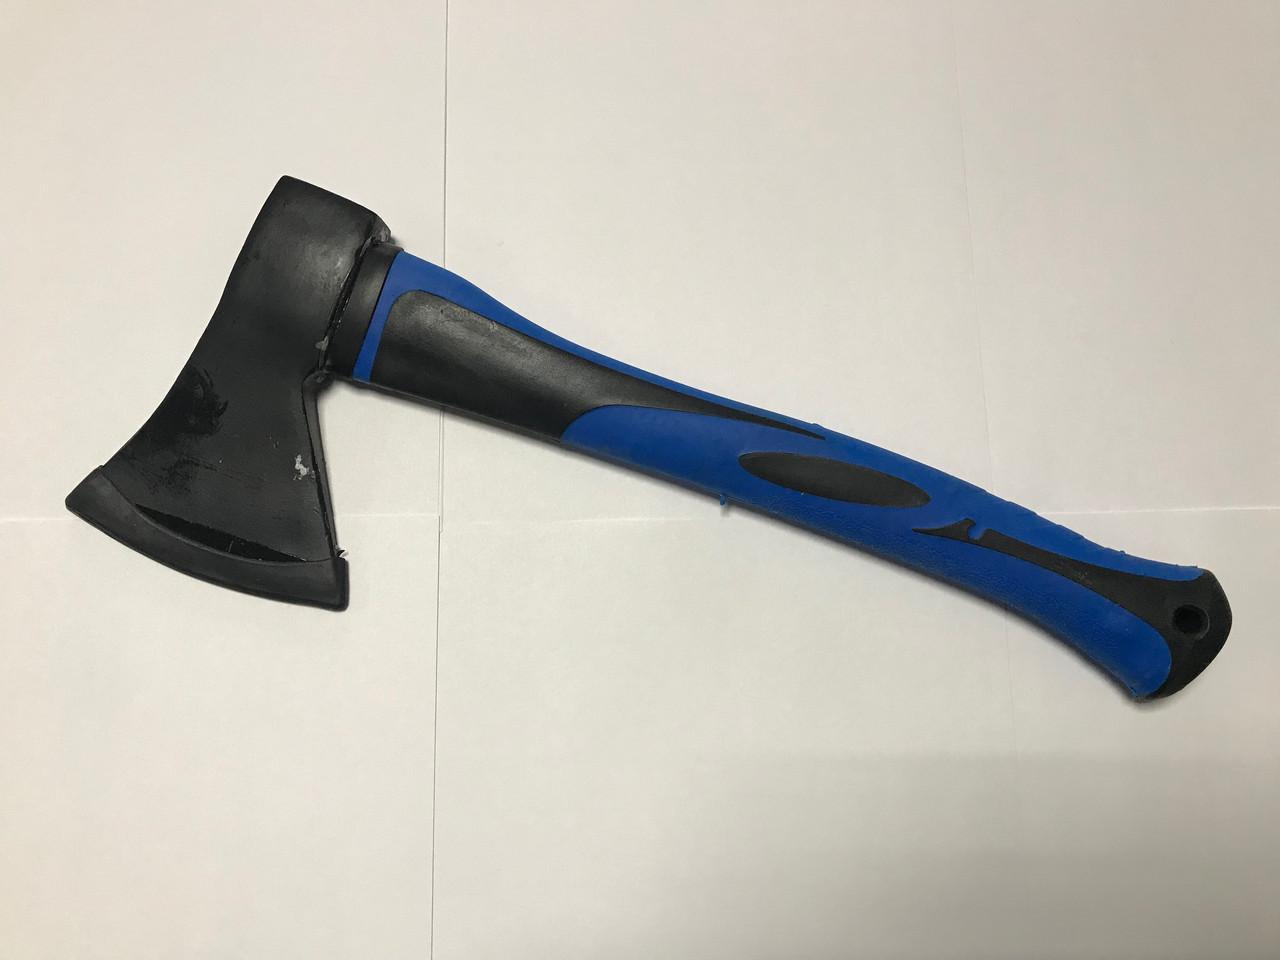 Топор-колун пластиковая рукоятка